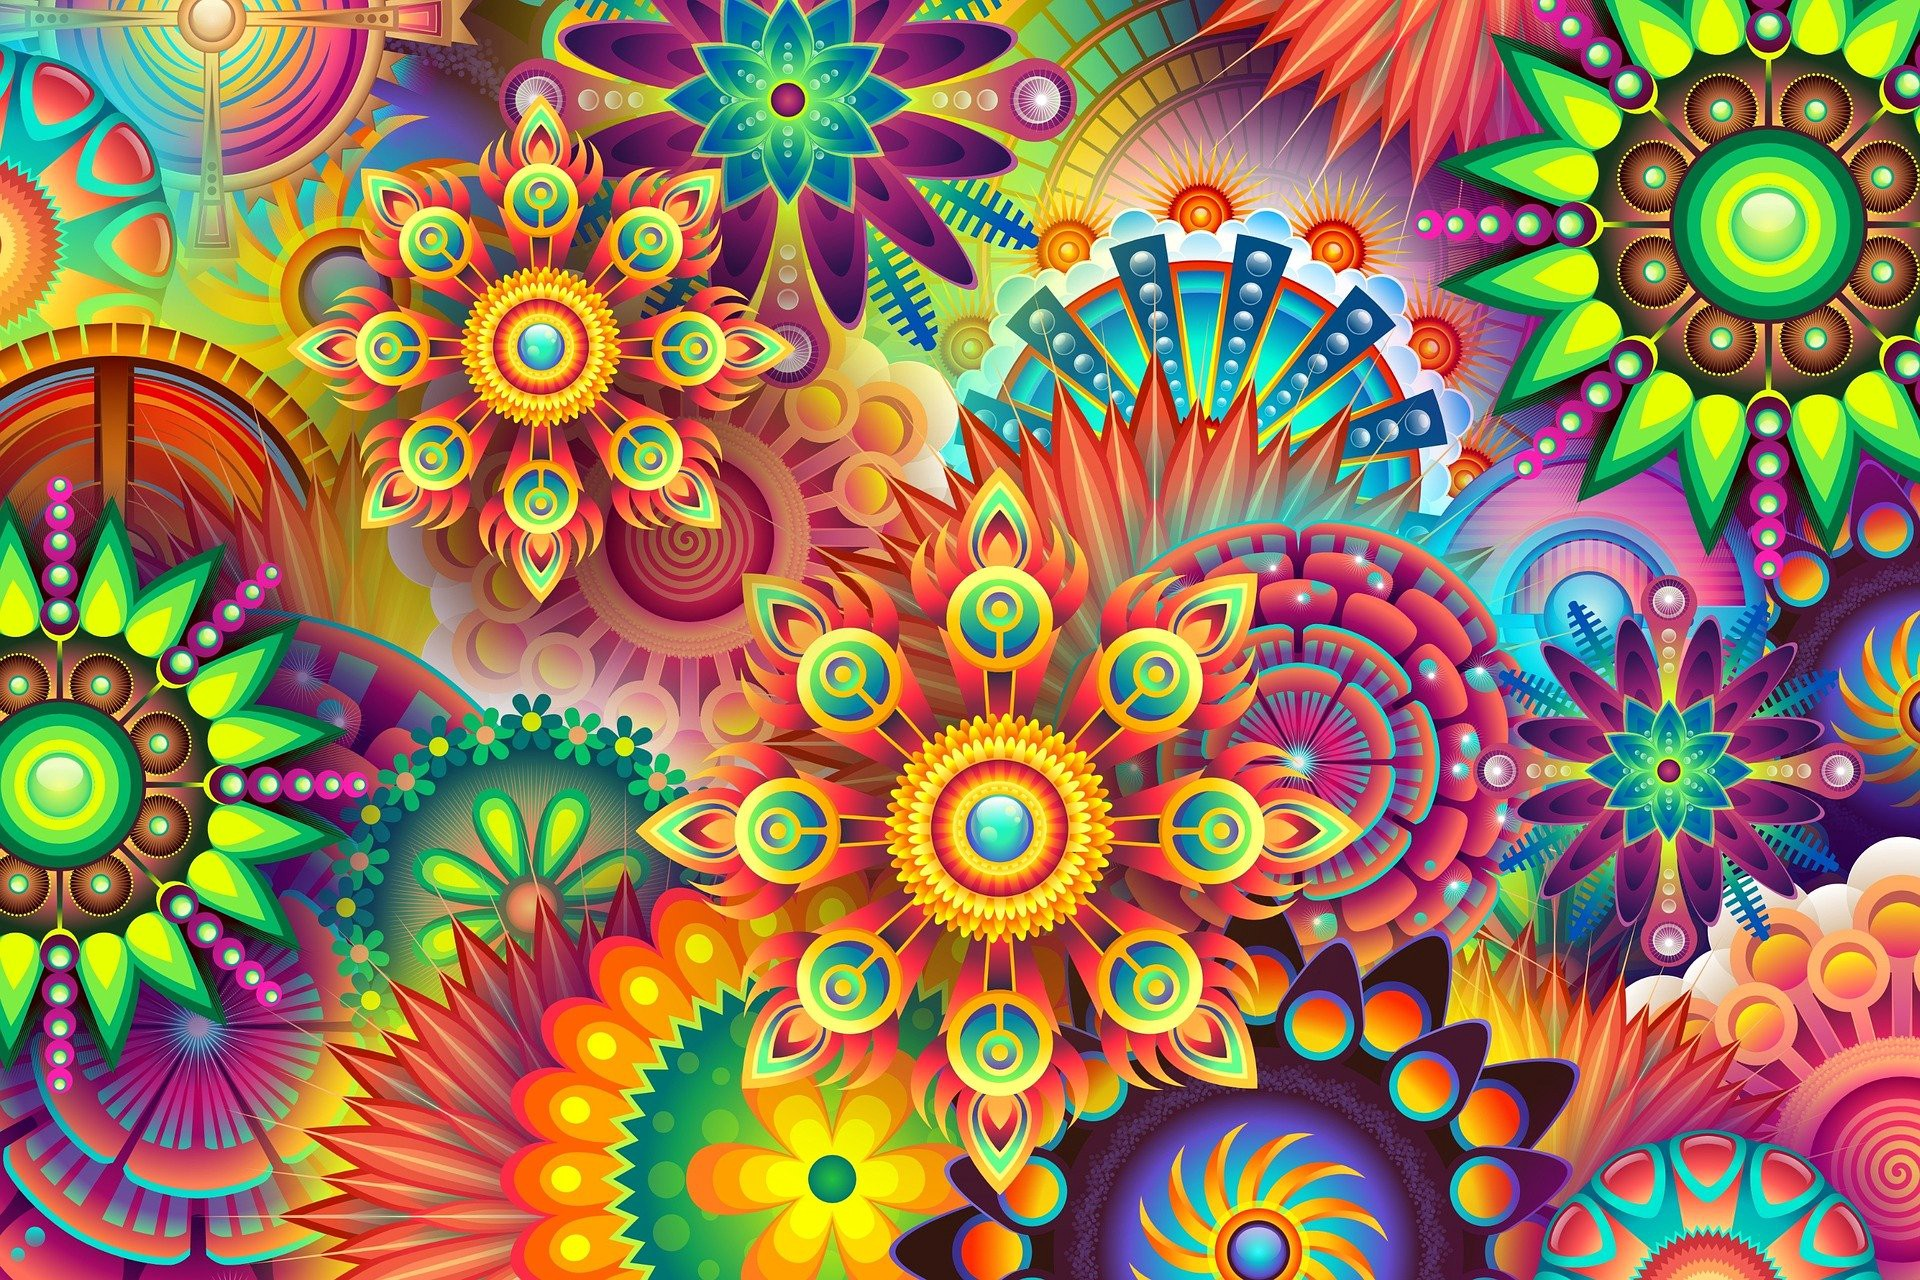 Why I Decided to Revisit Psychedelics   by N.J. Elliott   Entheogen   Medium